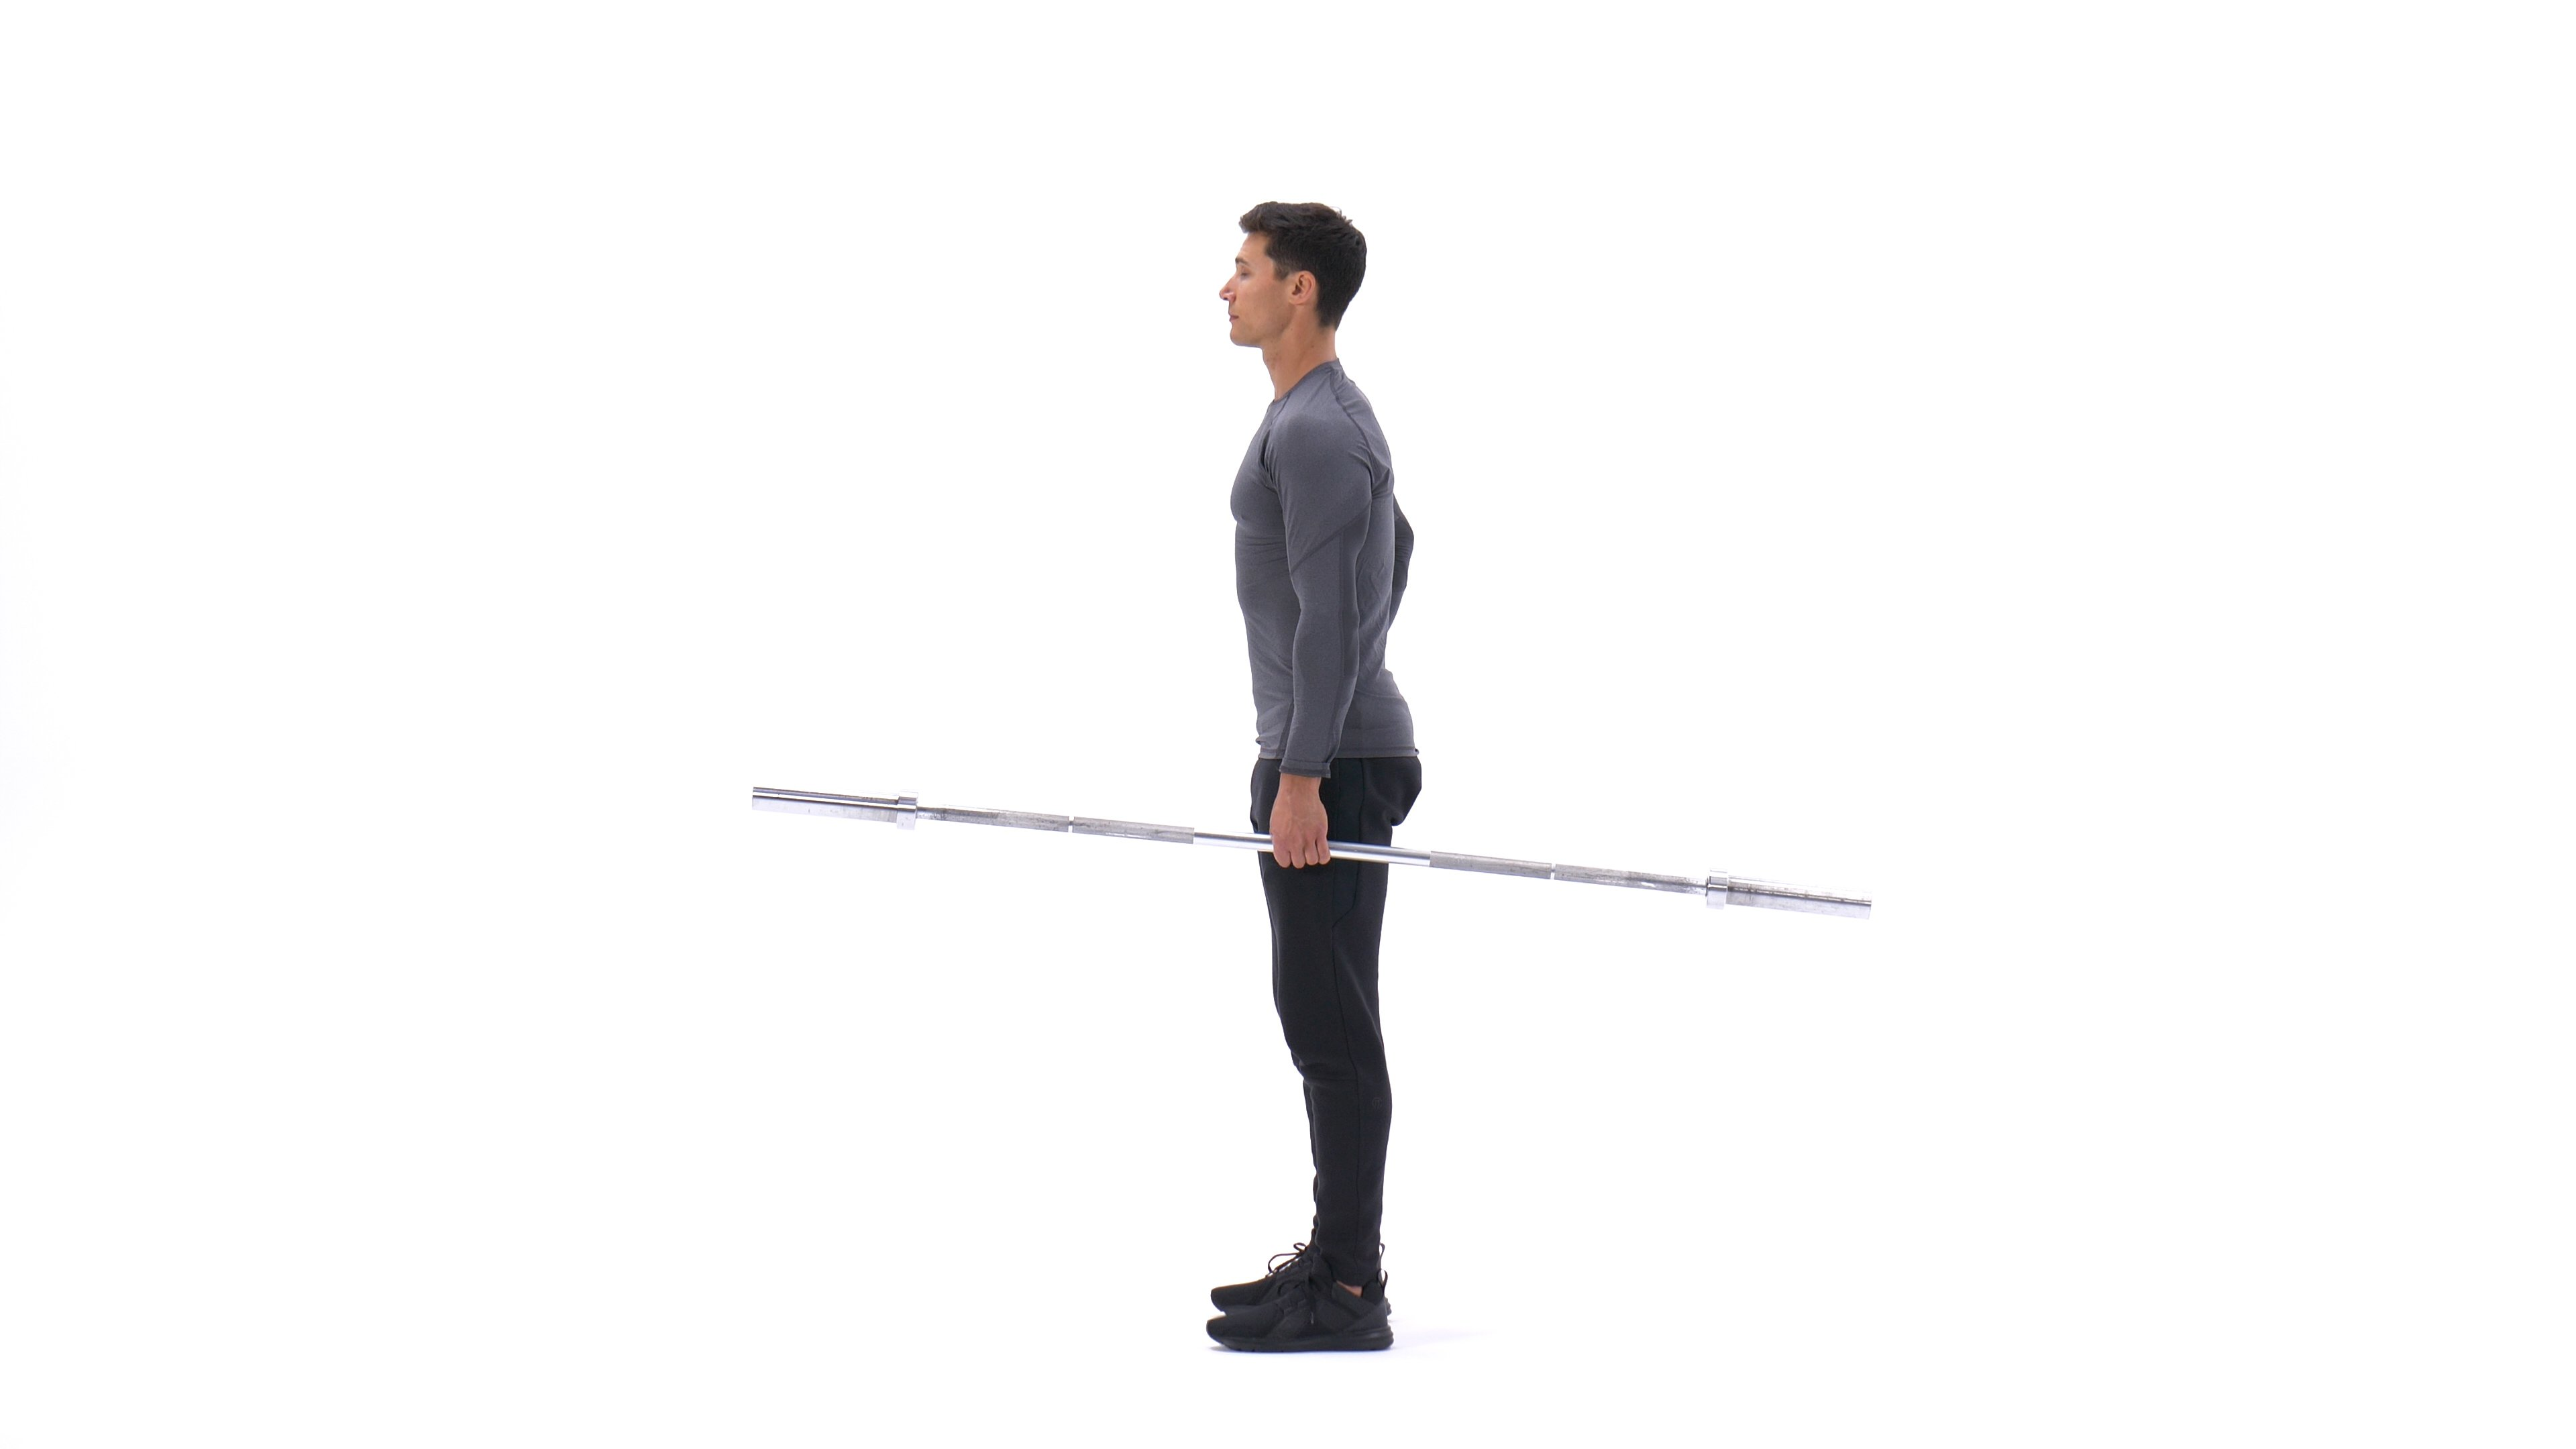 Single-arm side deadlift image